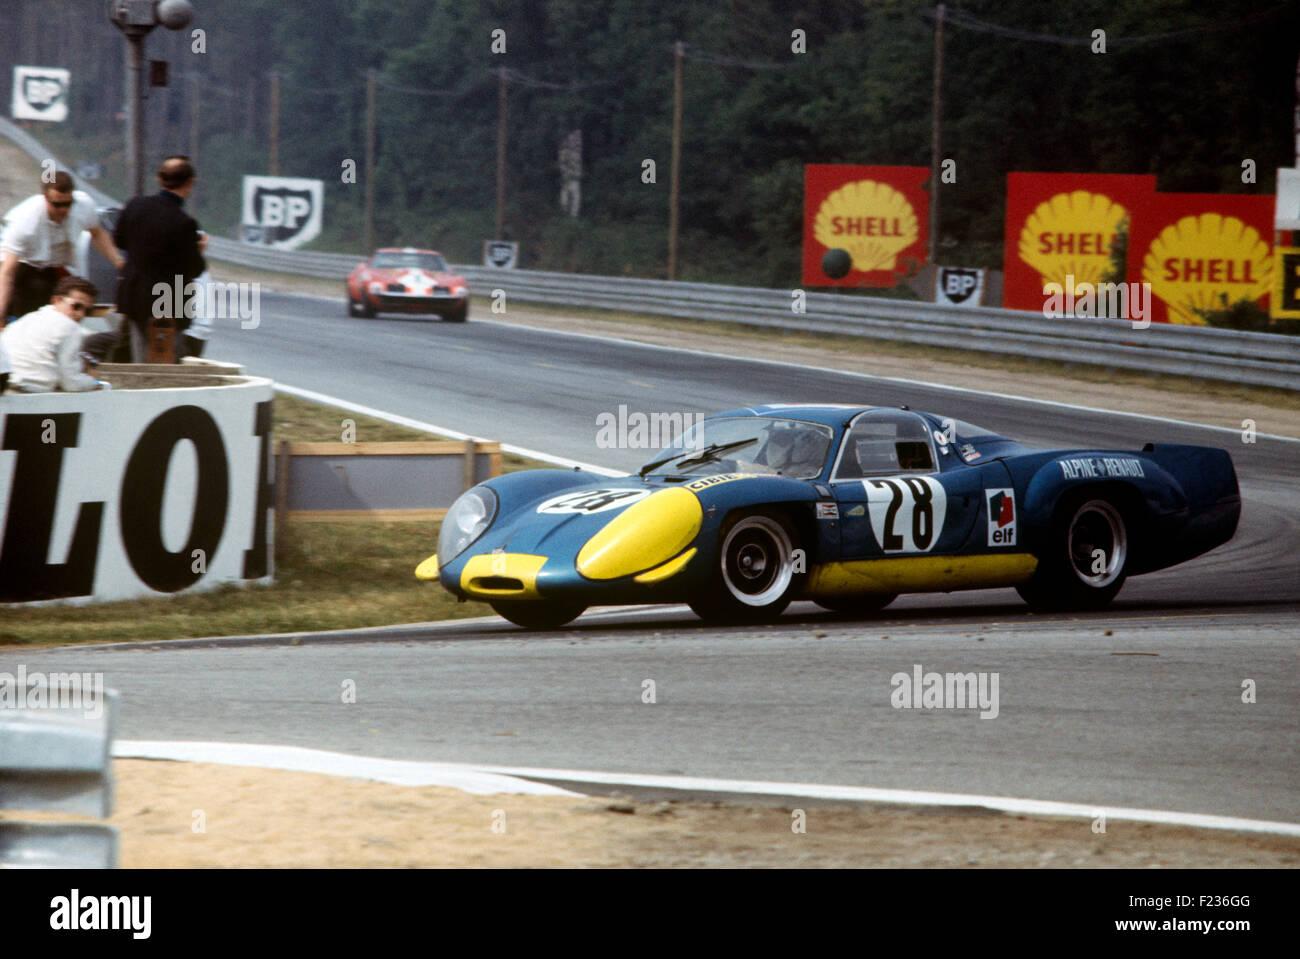 Car Dashboard Wallpaper Jean Vinatier Andre De Cortanze Alpine 220 Renault At The